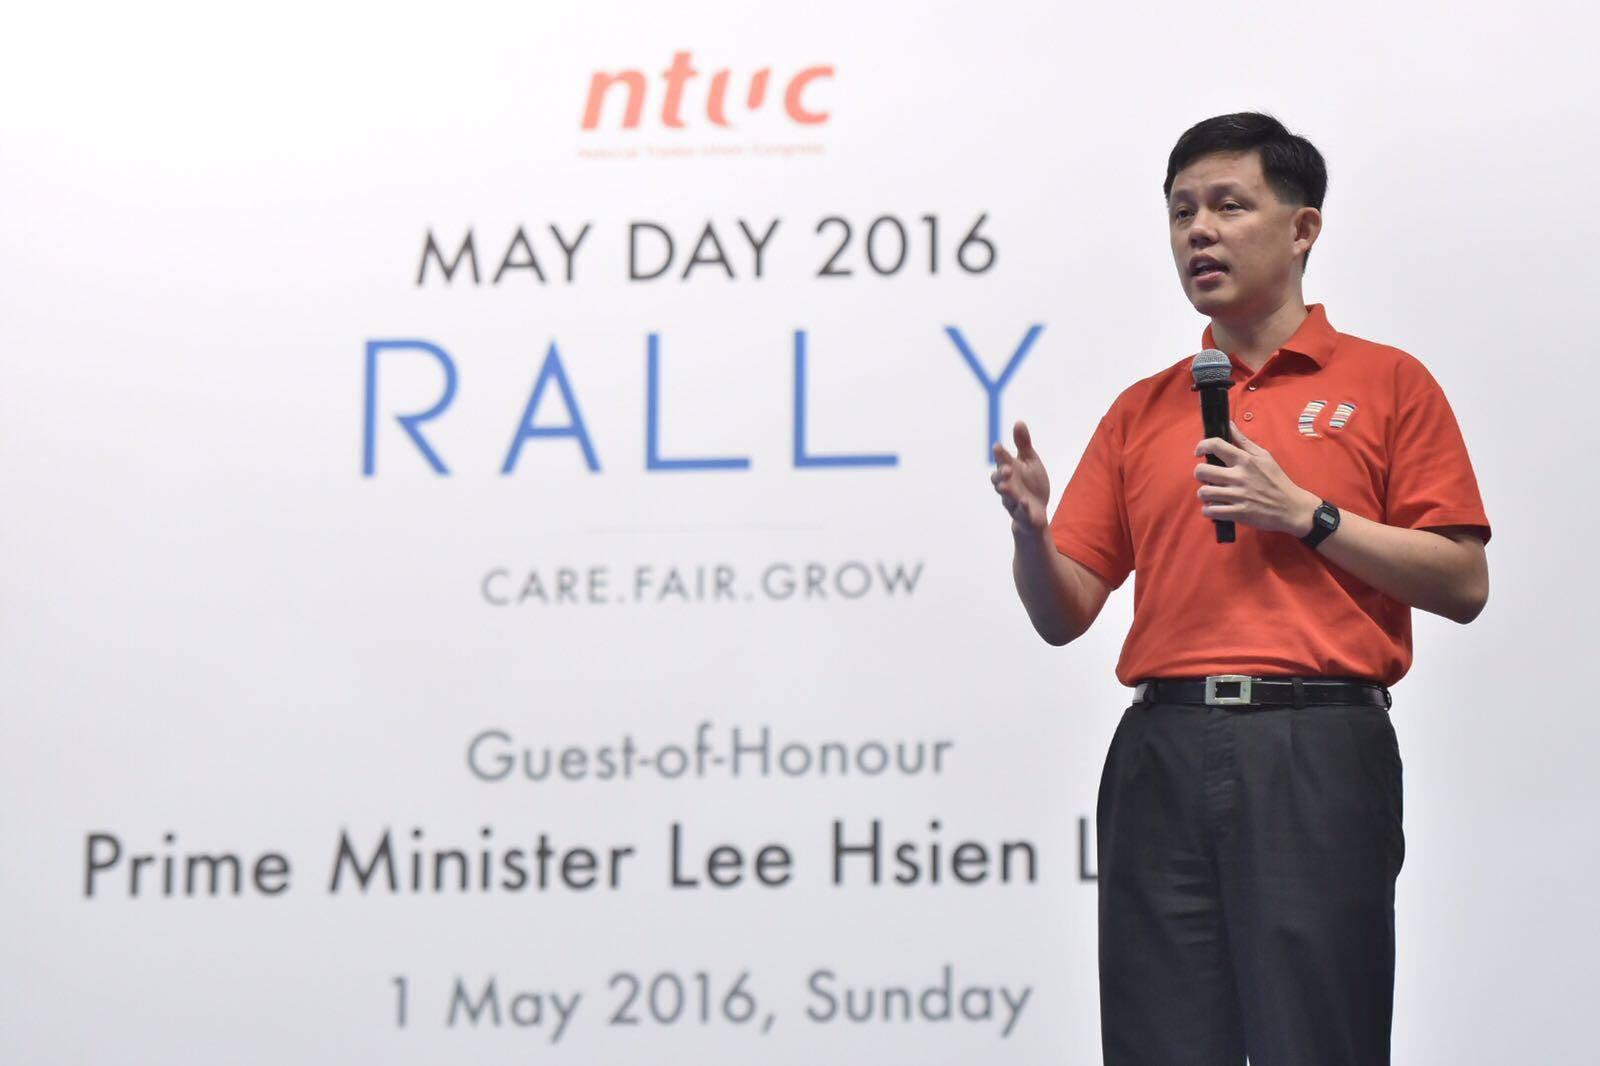 Chan_Chun_Sing_May_Day_Rally_2016